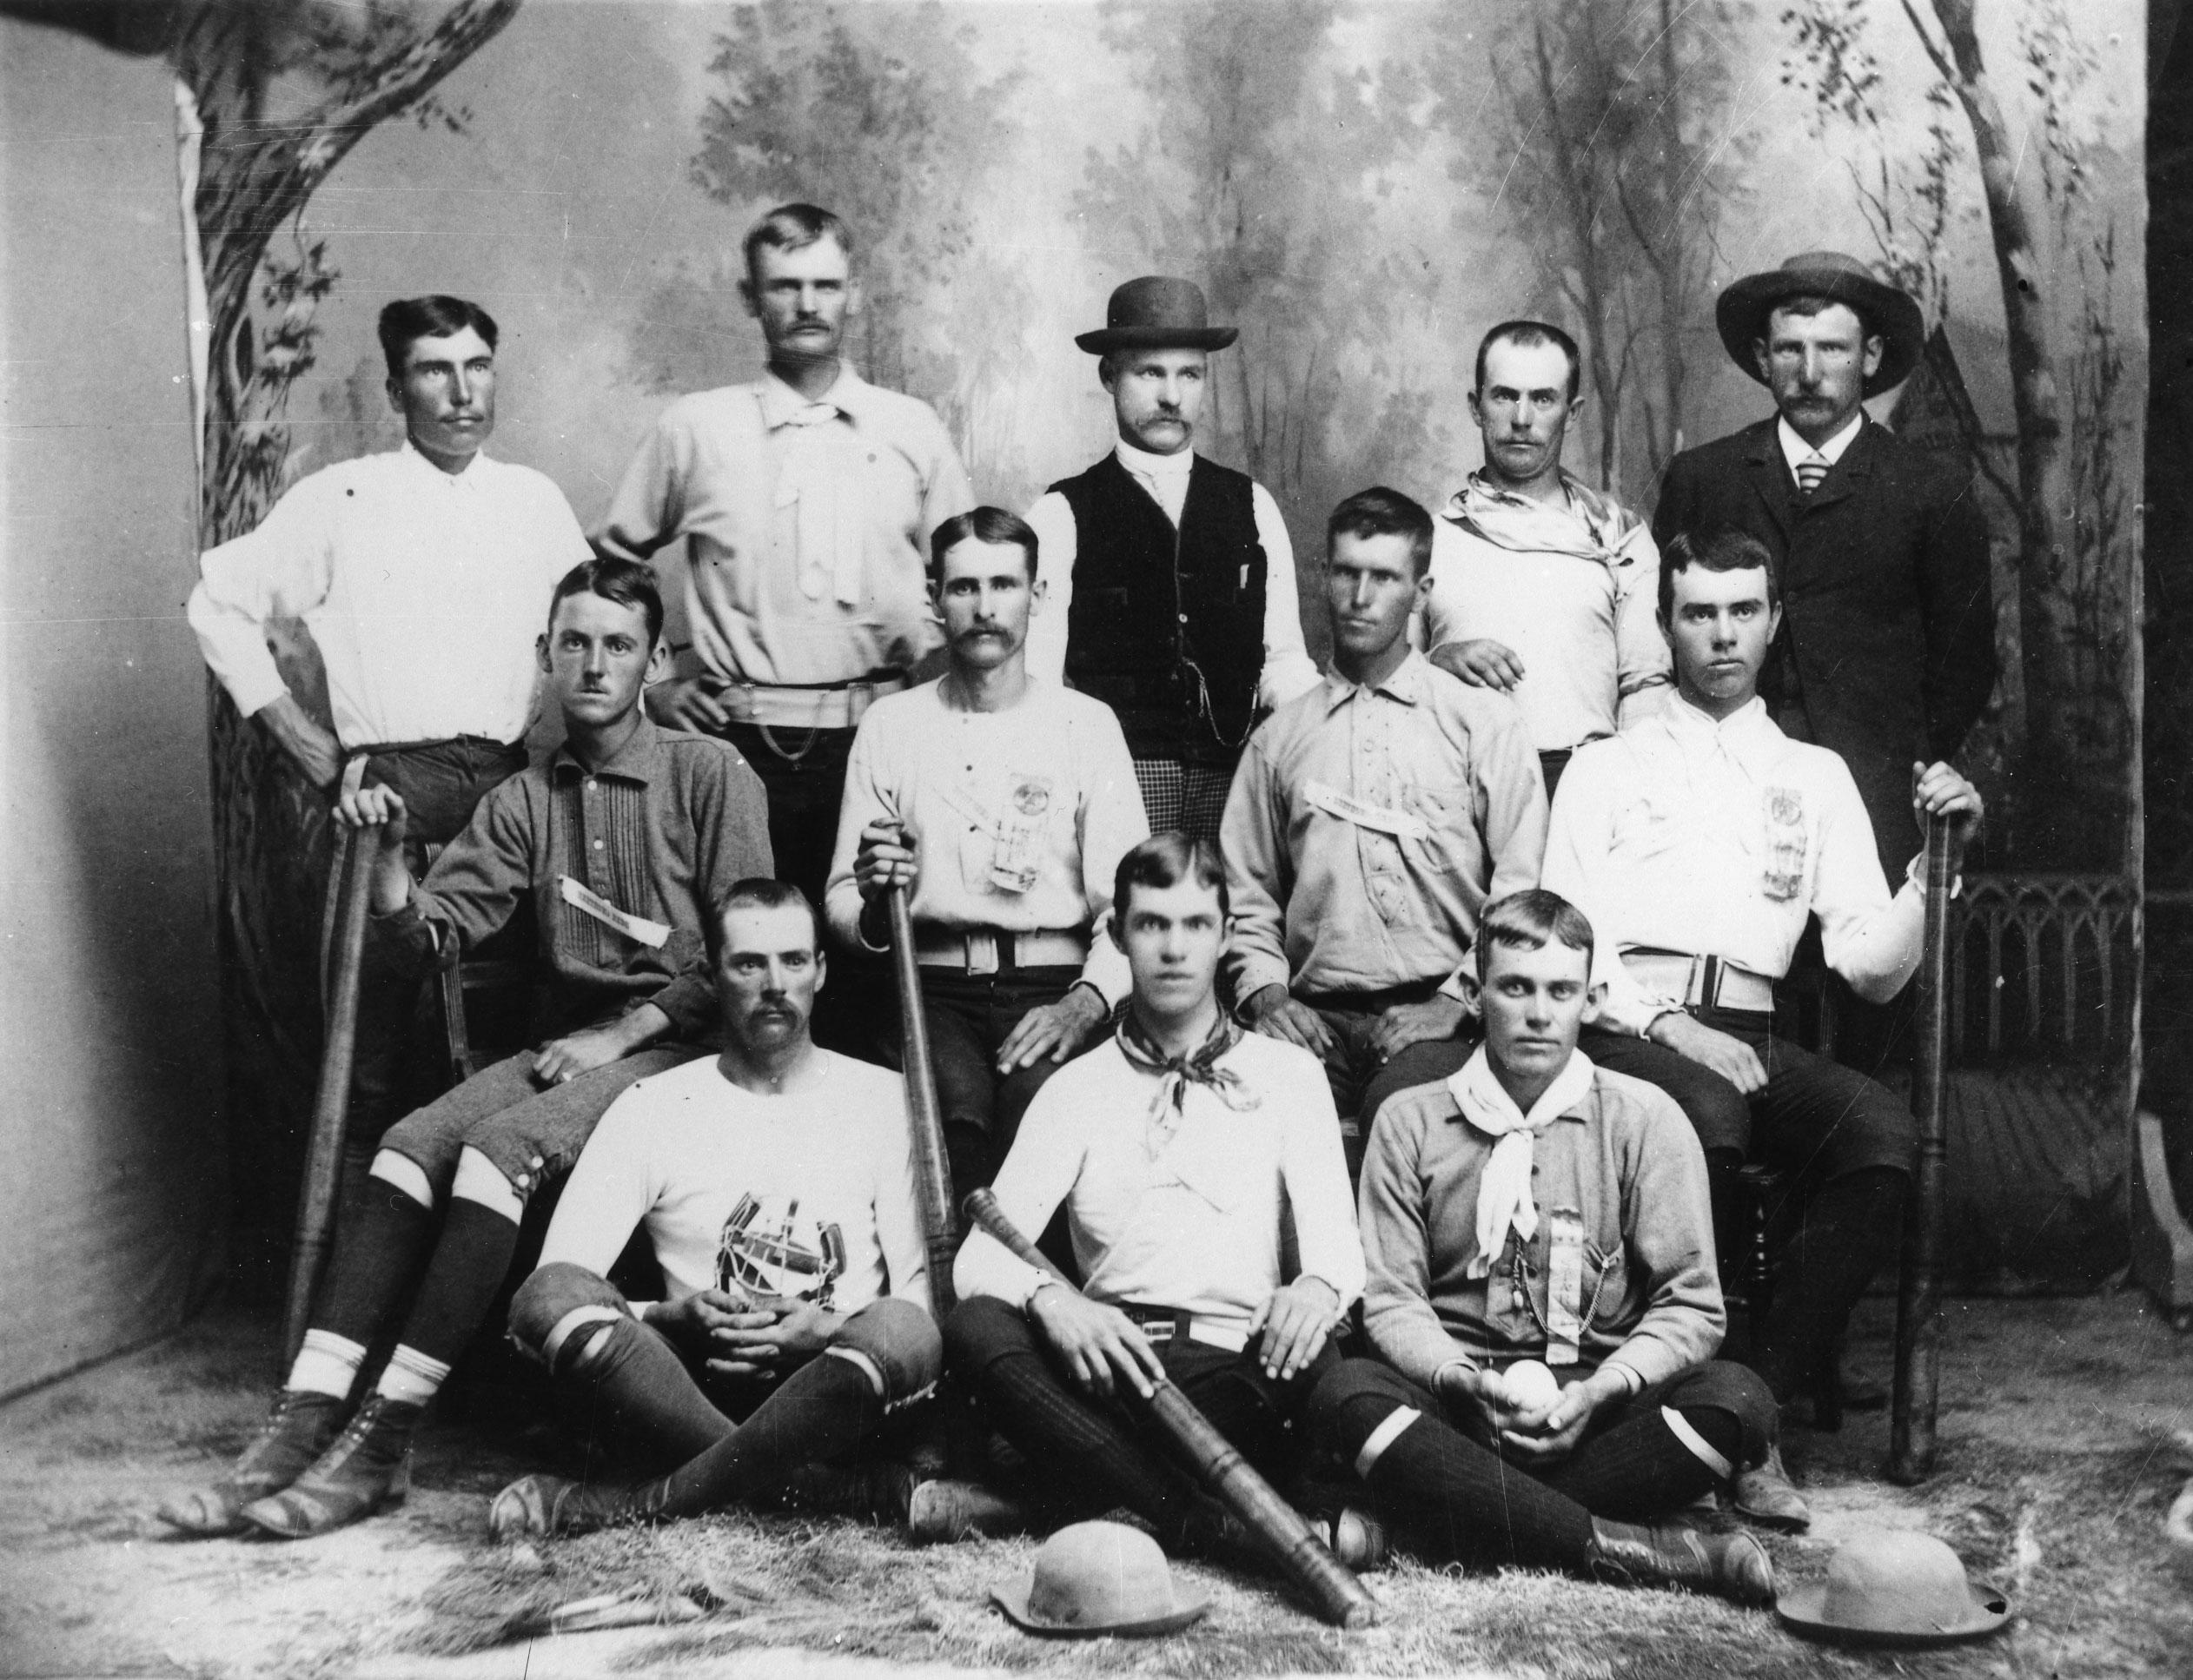 Berthoud baseball team 1880